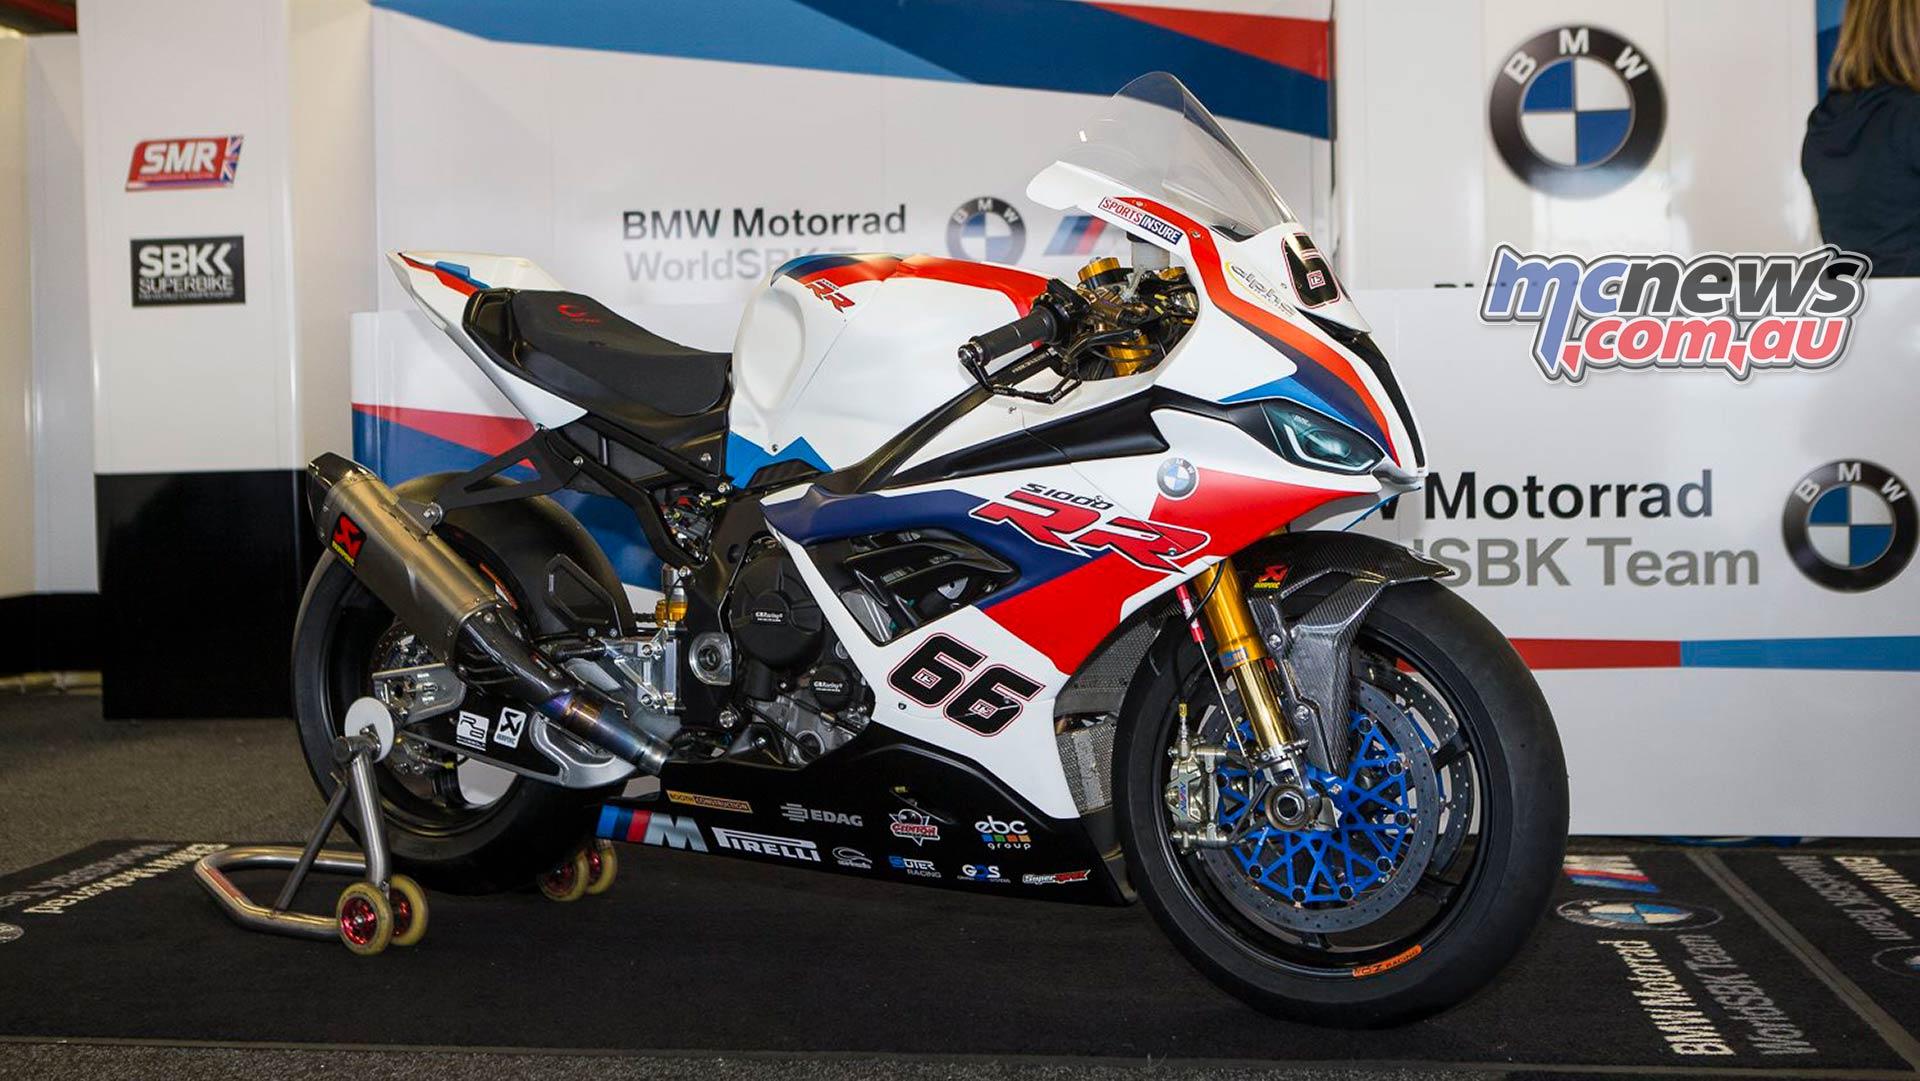 Bmw Motorrad Worldsbk Team Show Off Their New Livery Mcnews Com Au